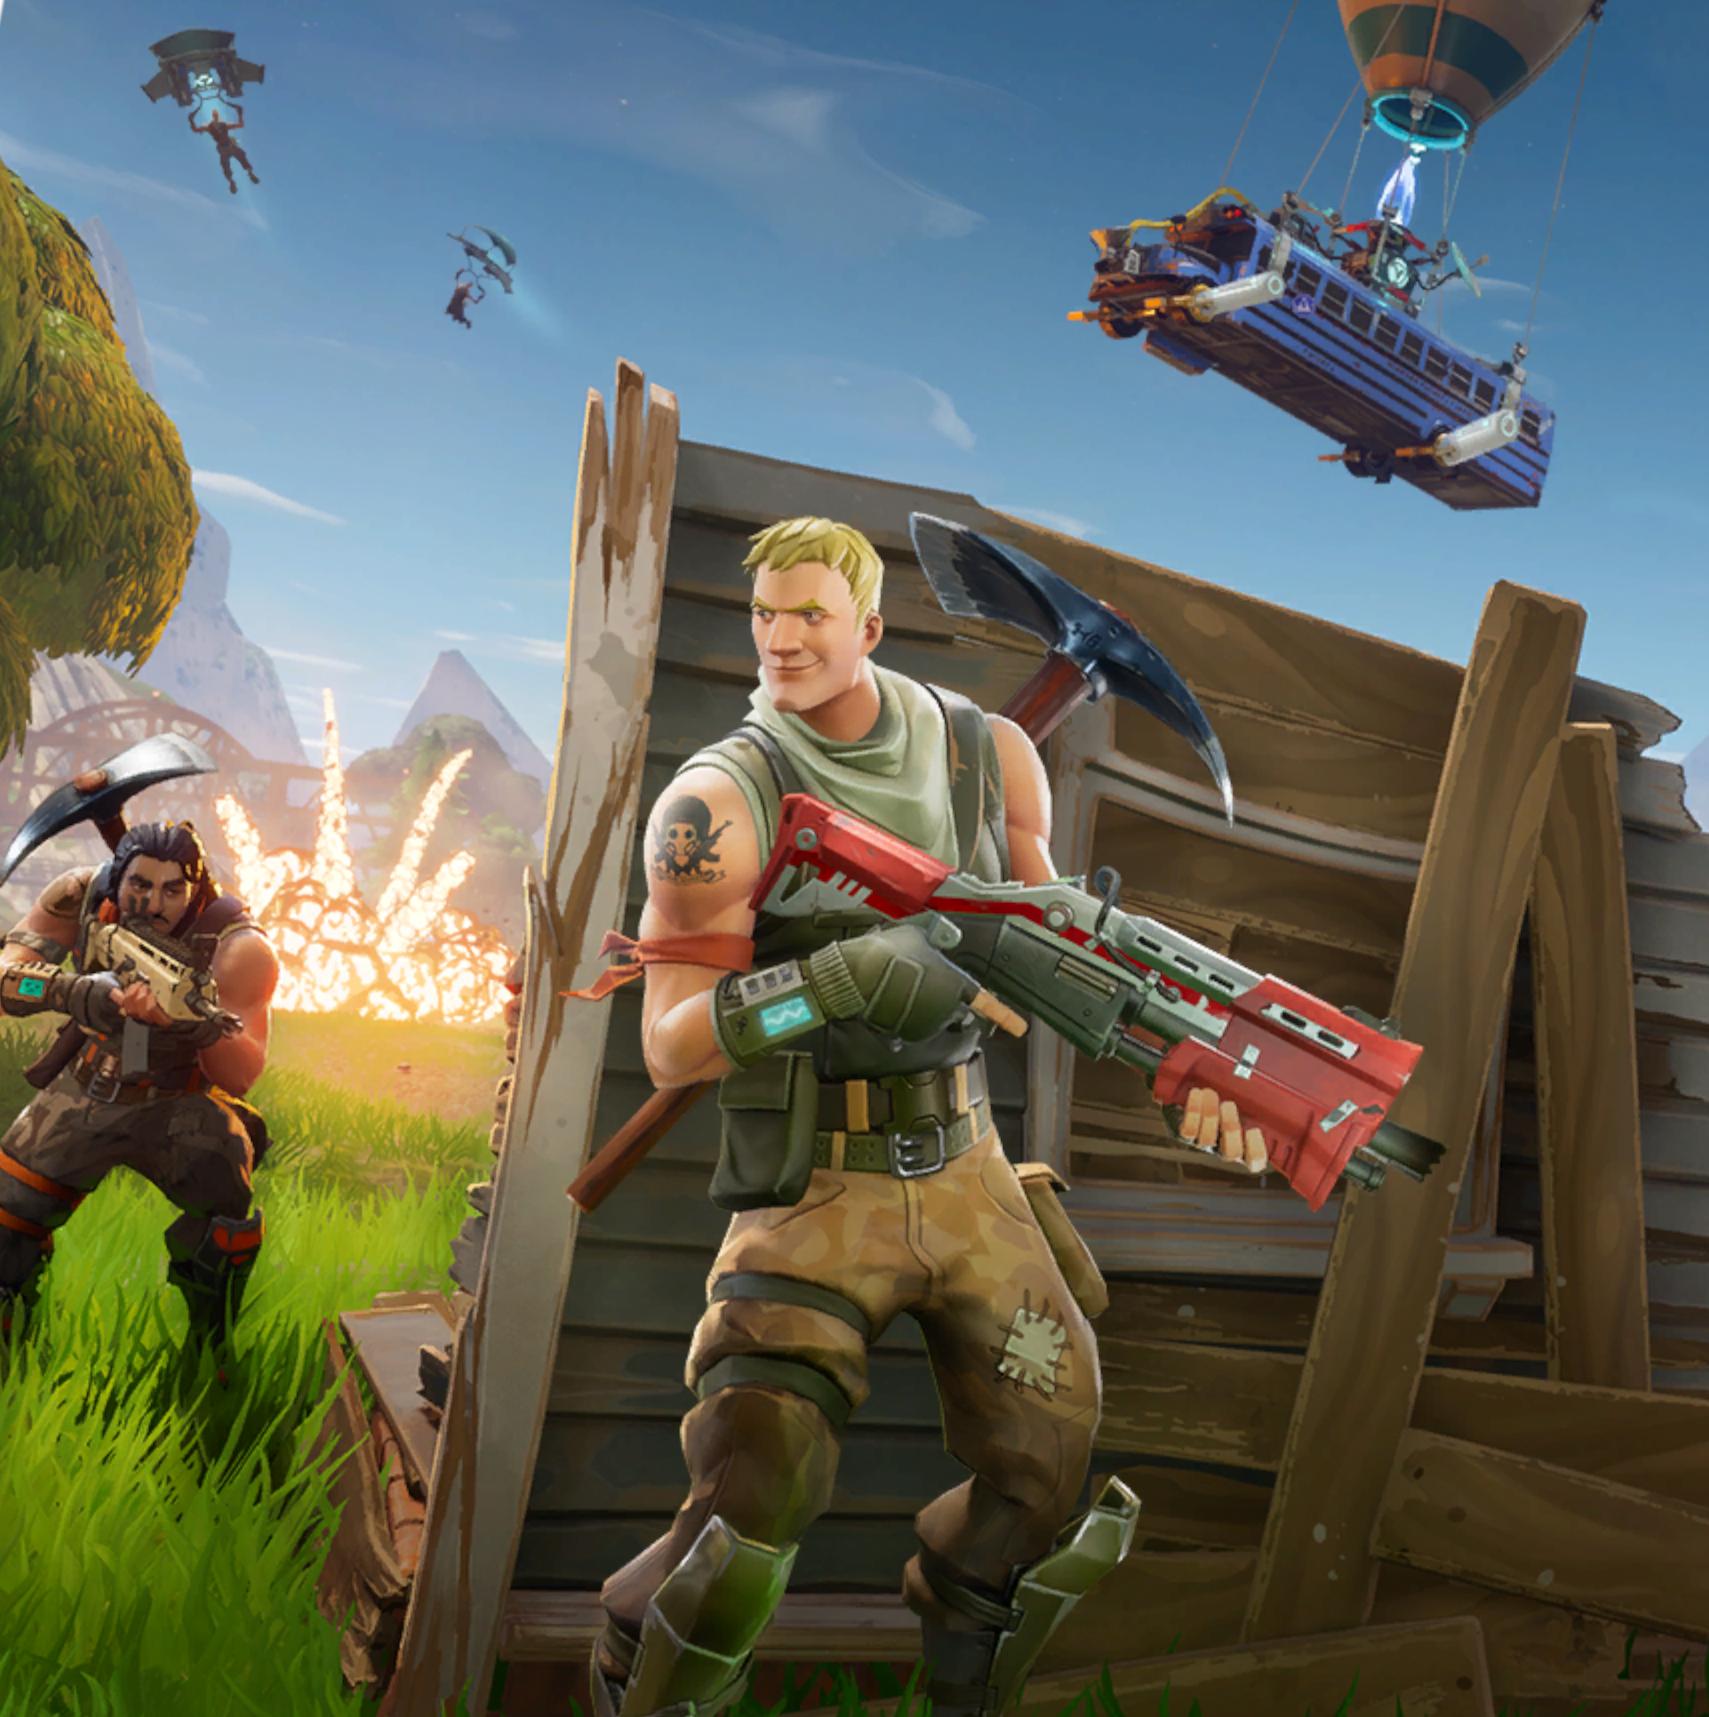 Enlarge Fortnites New Battle Royale Mode Includes This Explosive Splash Screen